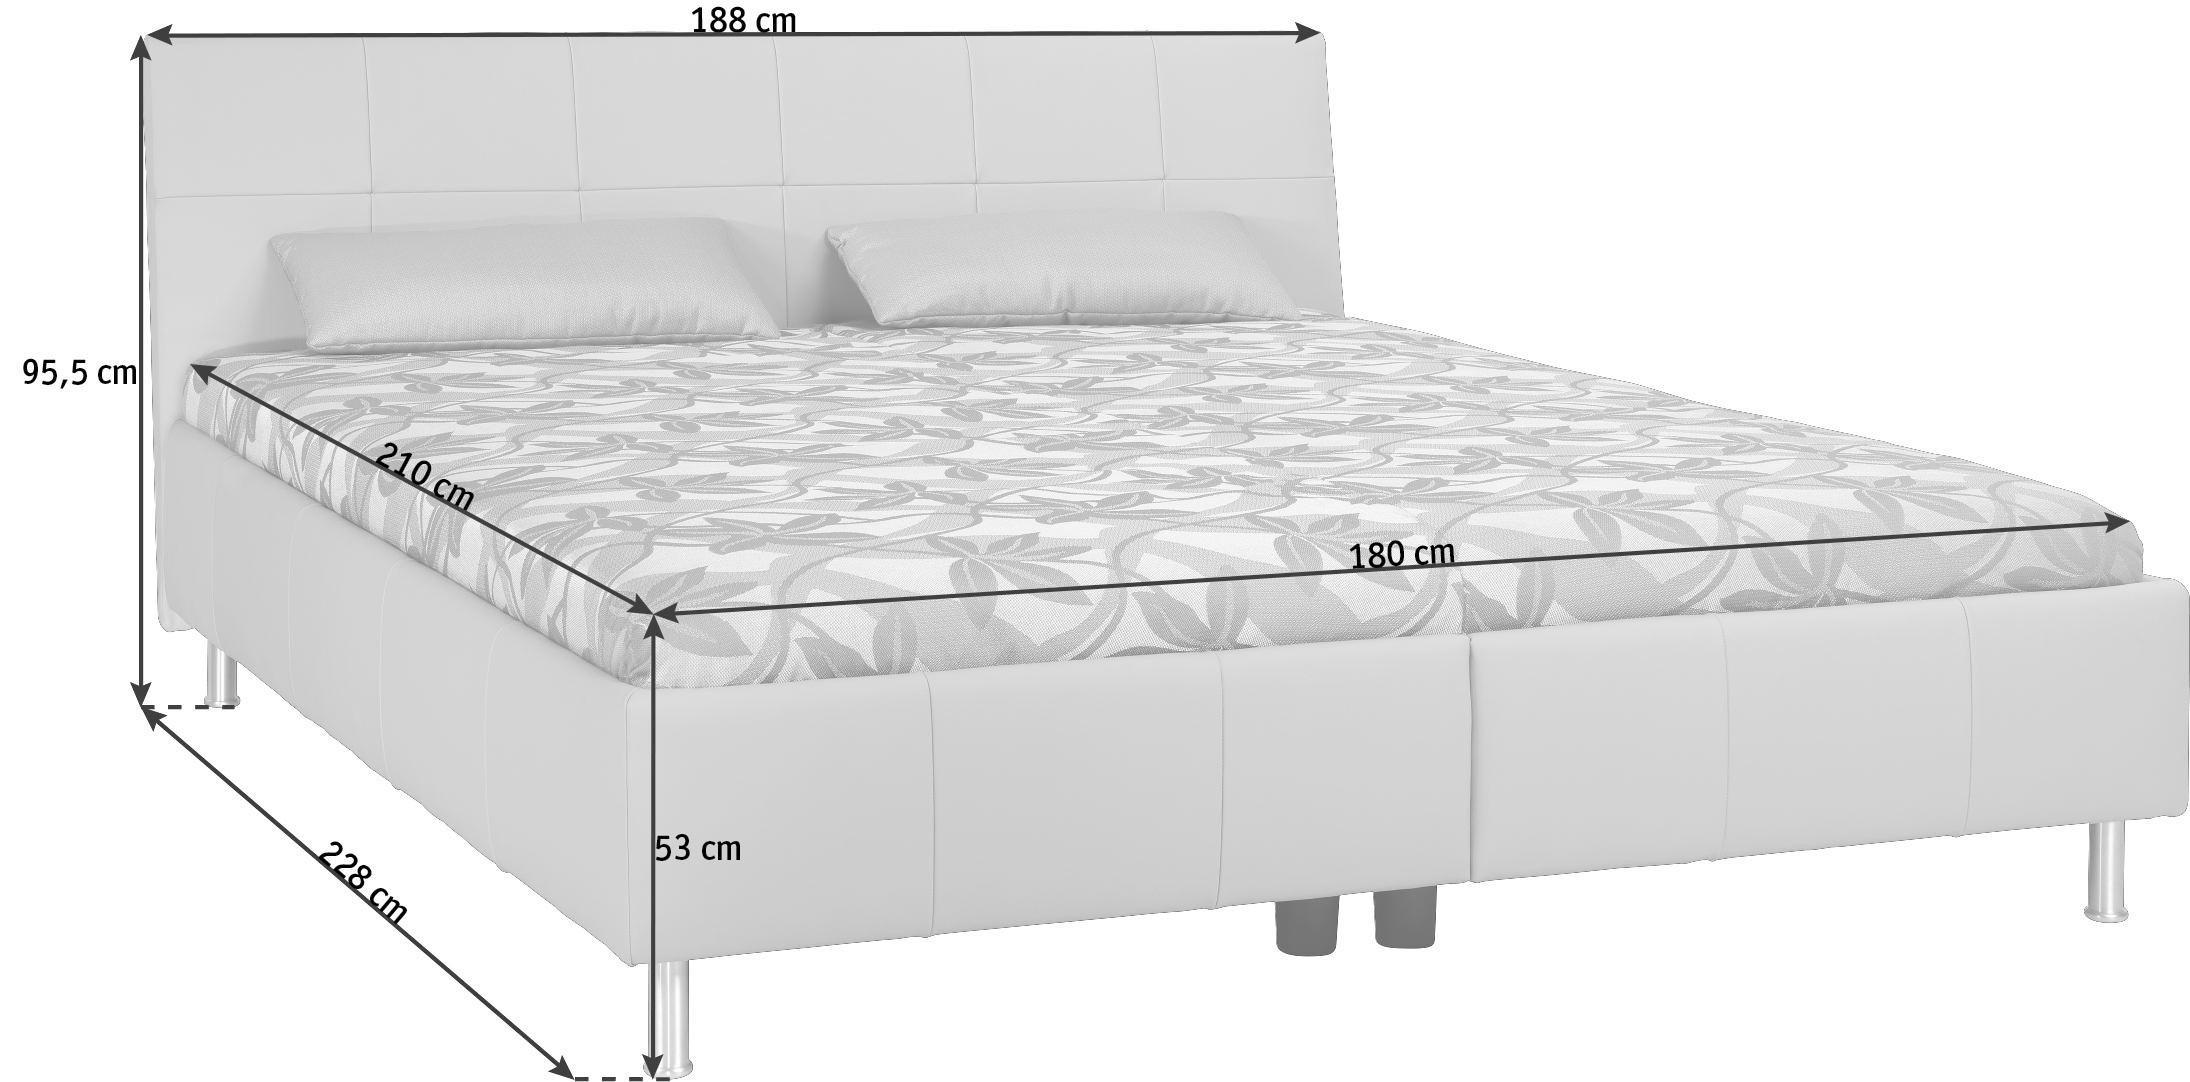 POLSTERBETT 180/210 cm - Alufarben/Grau, KONVENTIONELL, Leder/Textil (180/210cm) - ADA AUSTRIA